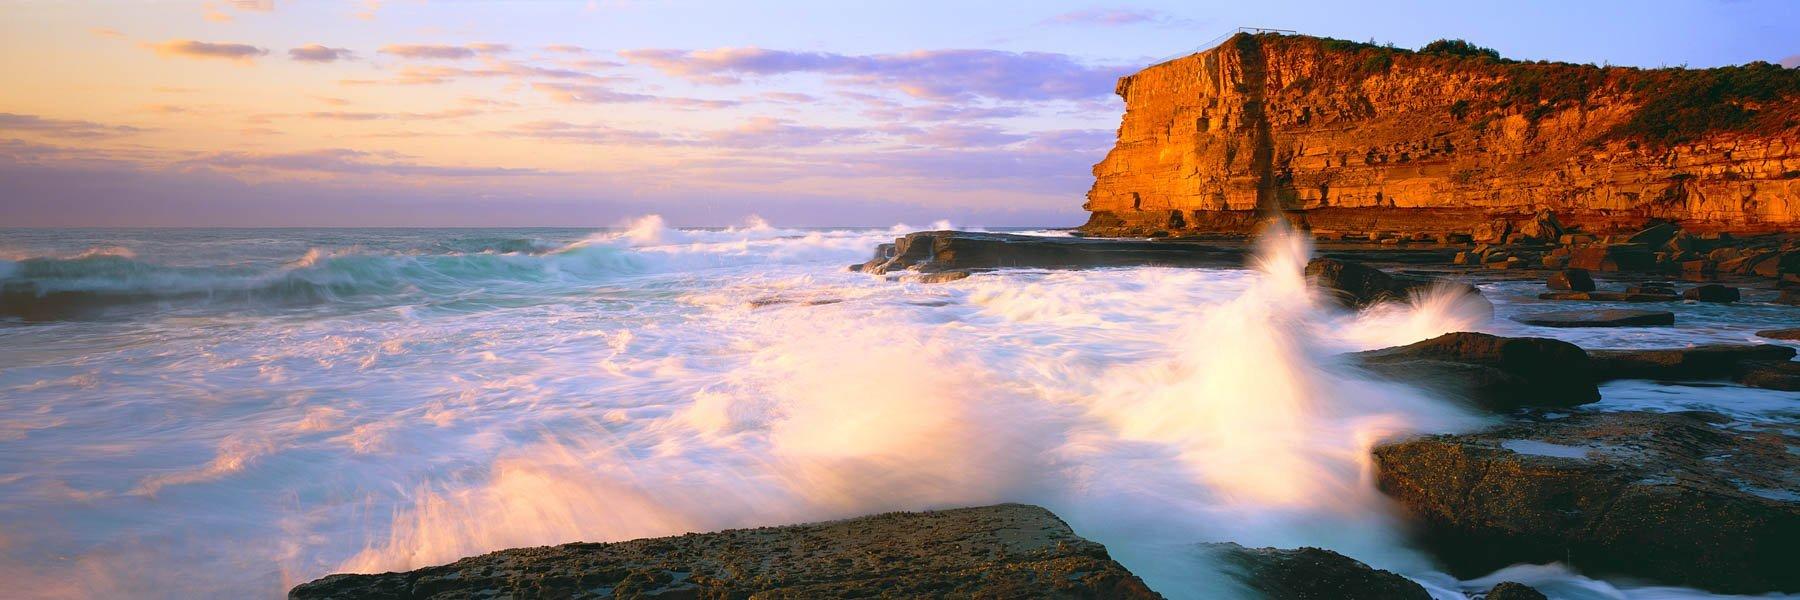 Sunrise over The Skillion, Central Coast, NSW, Australia.